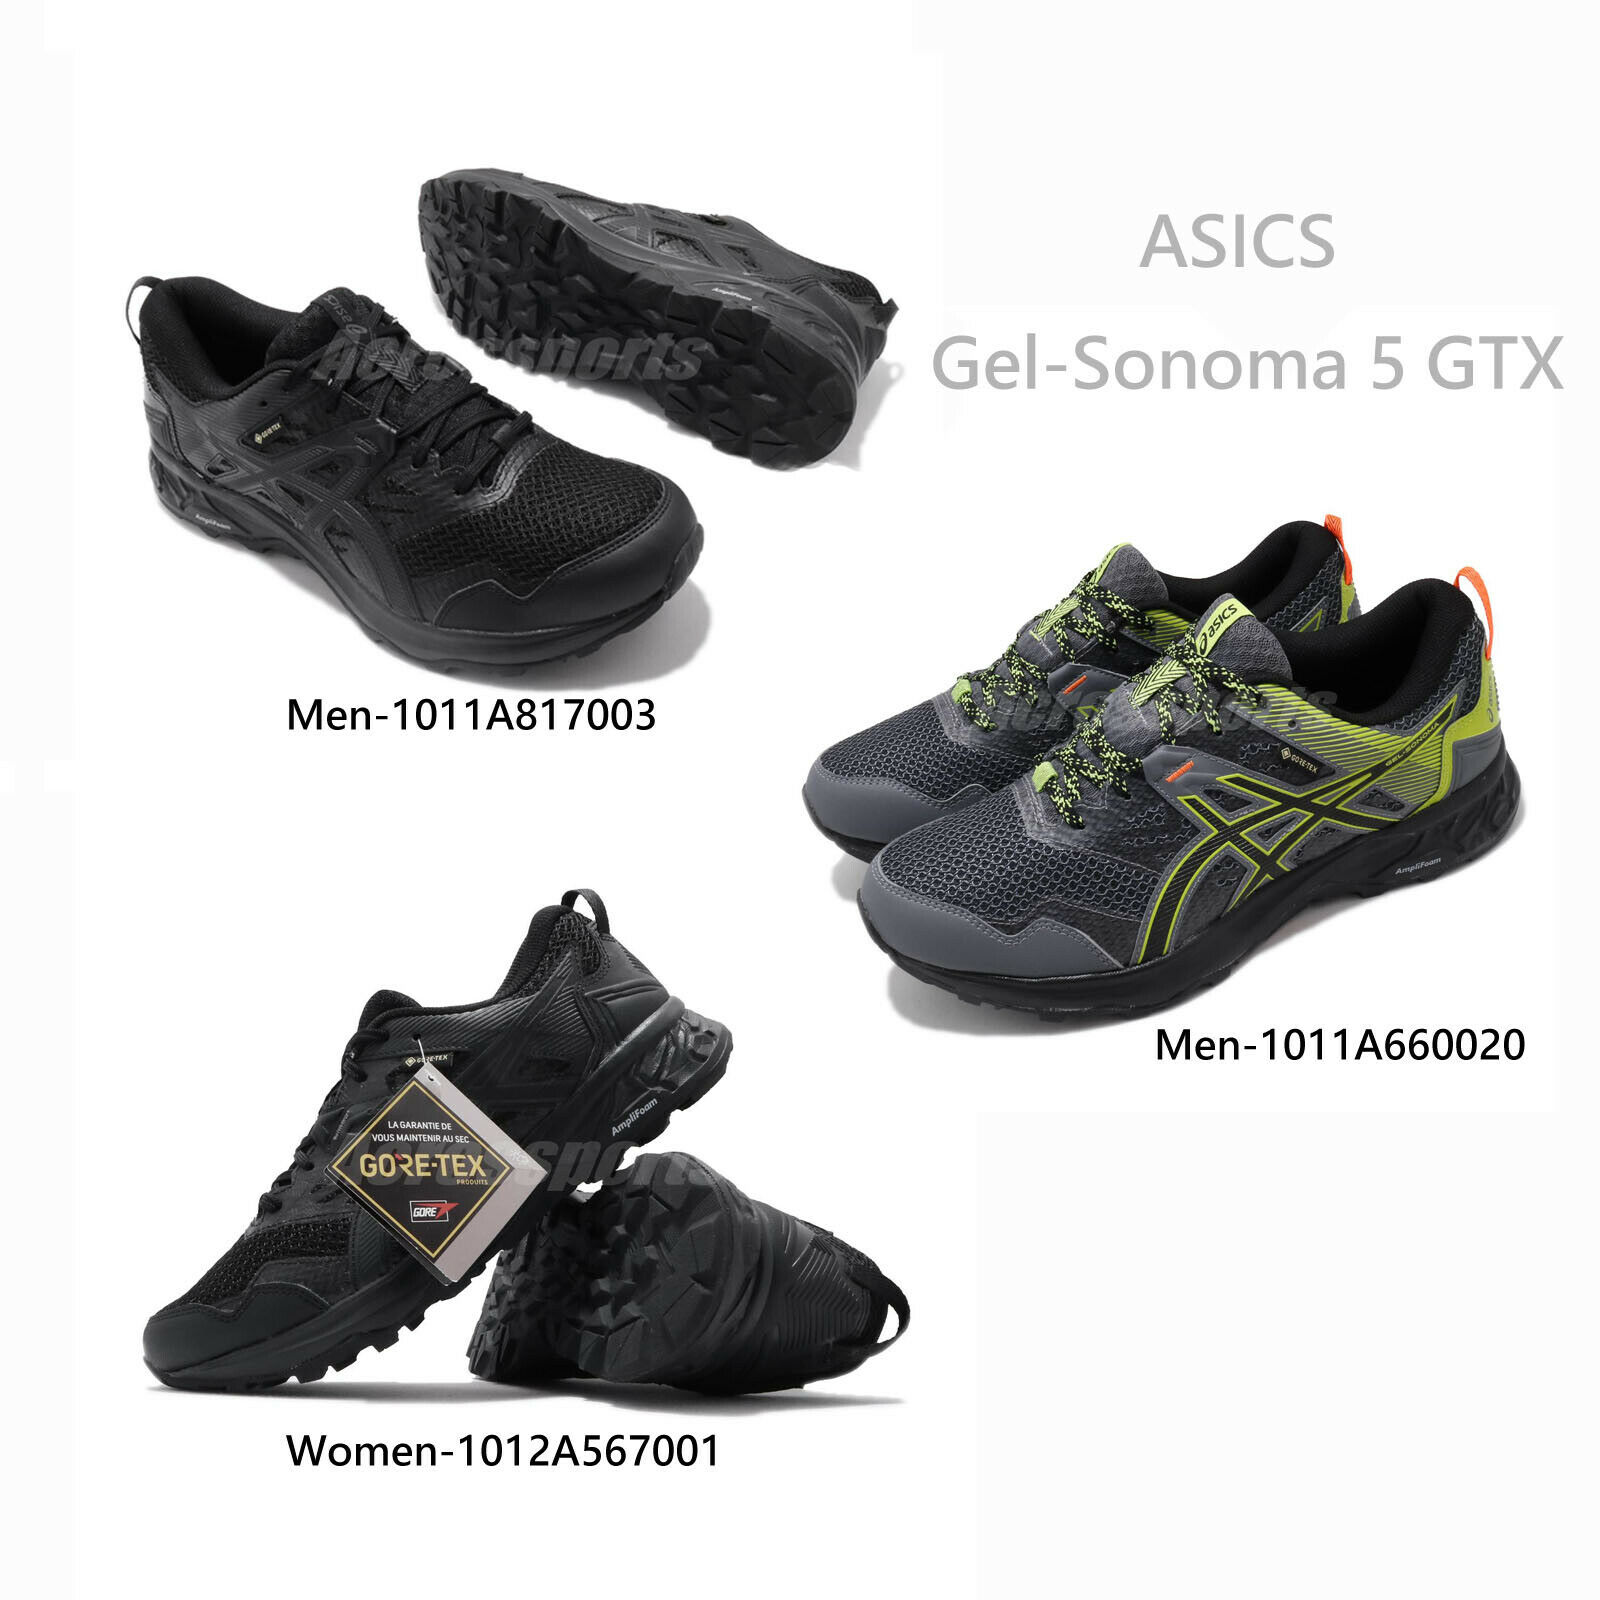 pescado Marchito Salón  Asics Gel Trail Lahar 5 GTX Femme for sale online | eBay